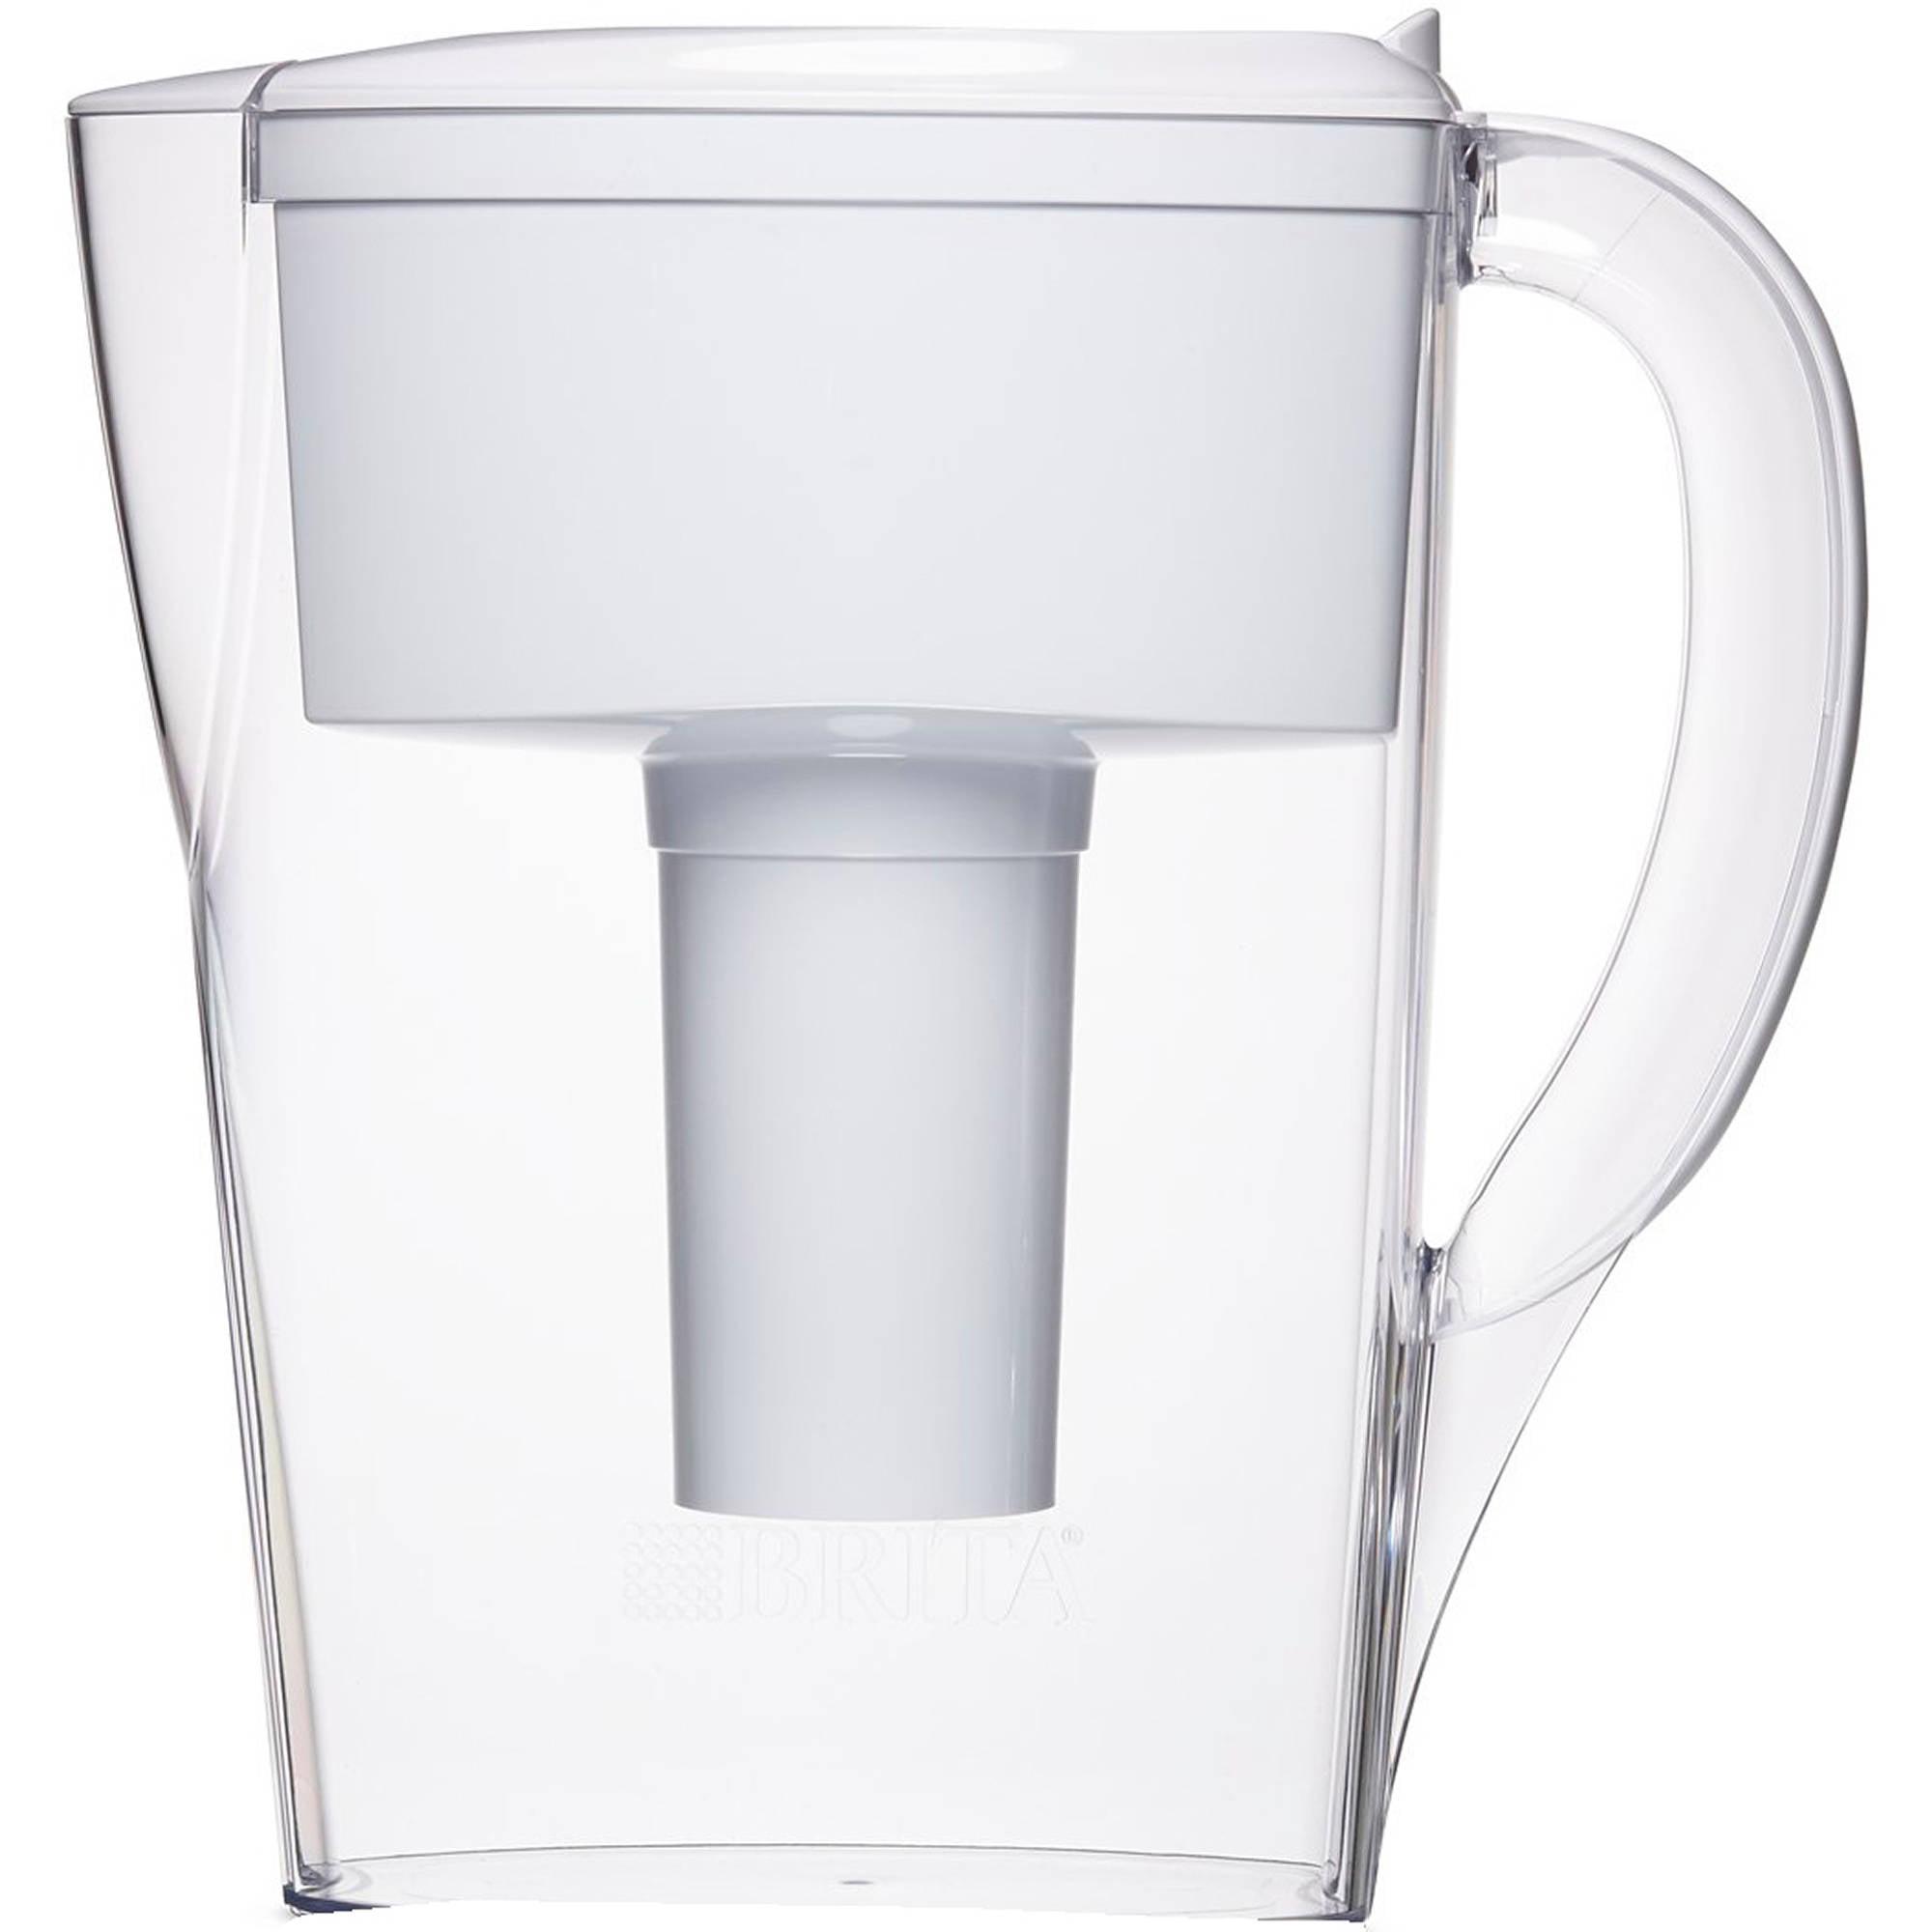 Brita Space Saver Water Filter Pitcher, White, 6 Cup